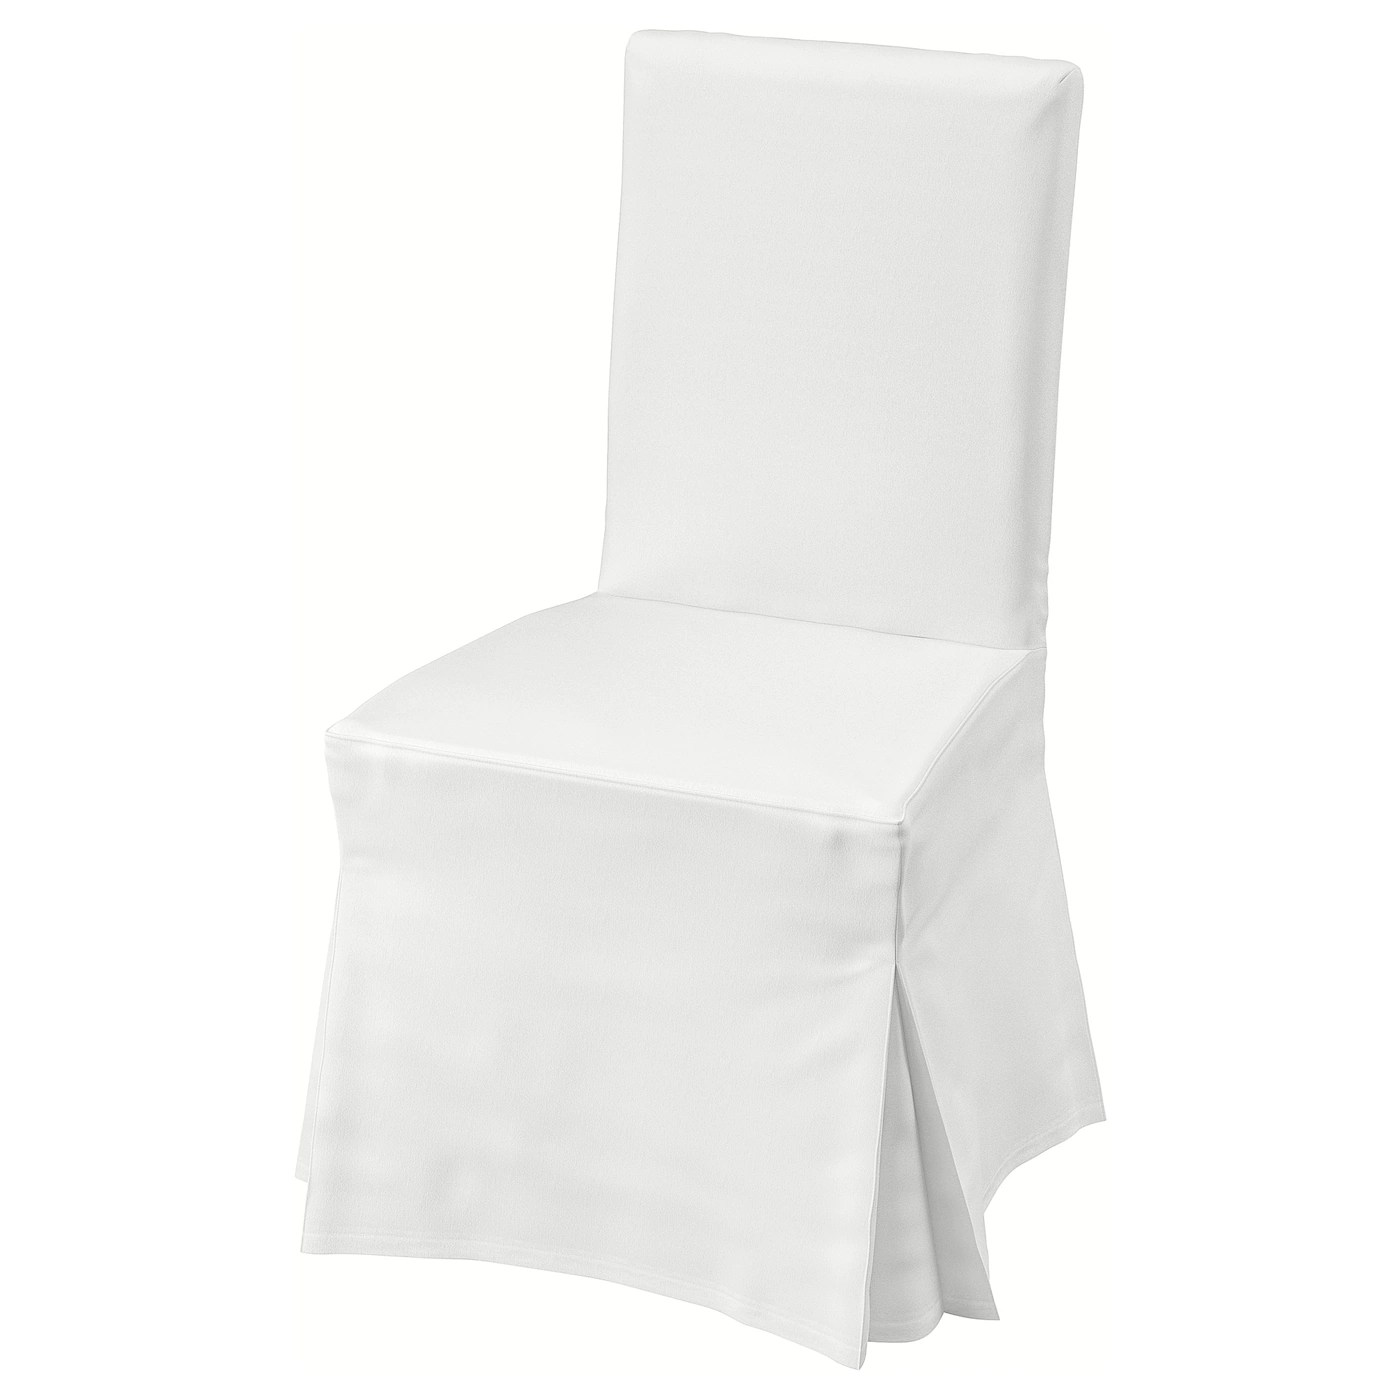 Henriksdal Chair With Long Cover Blekinge White Width 21 1 4 Order Here Ikea